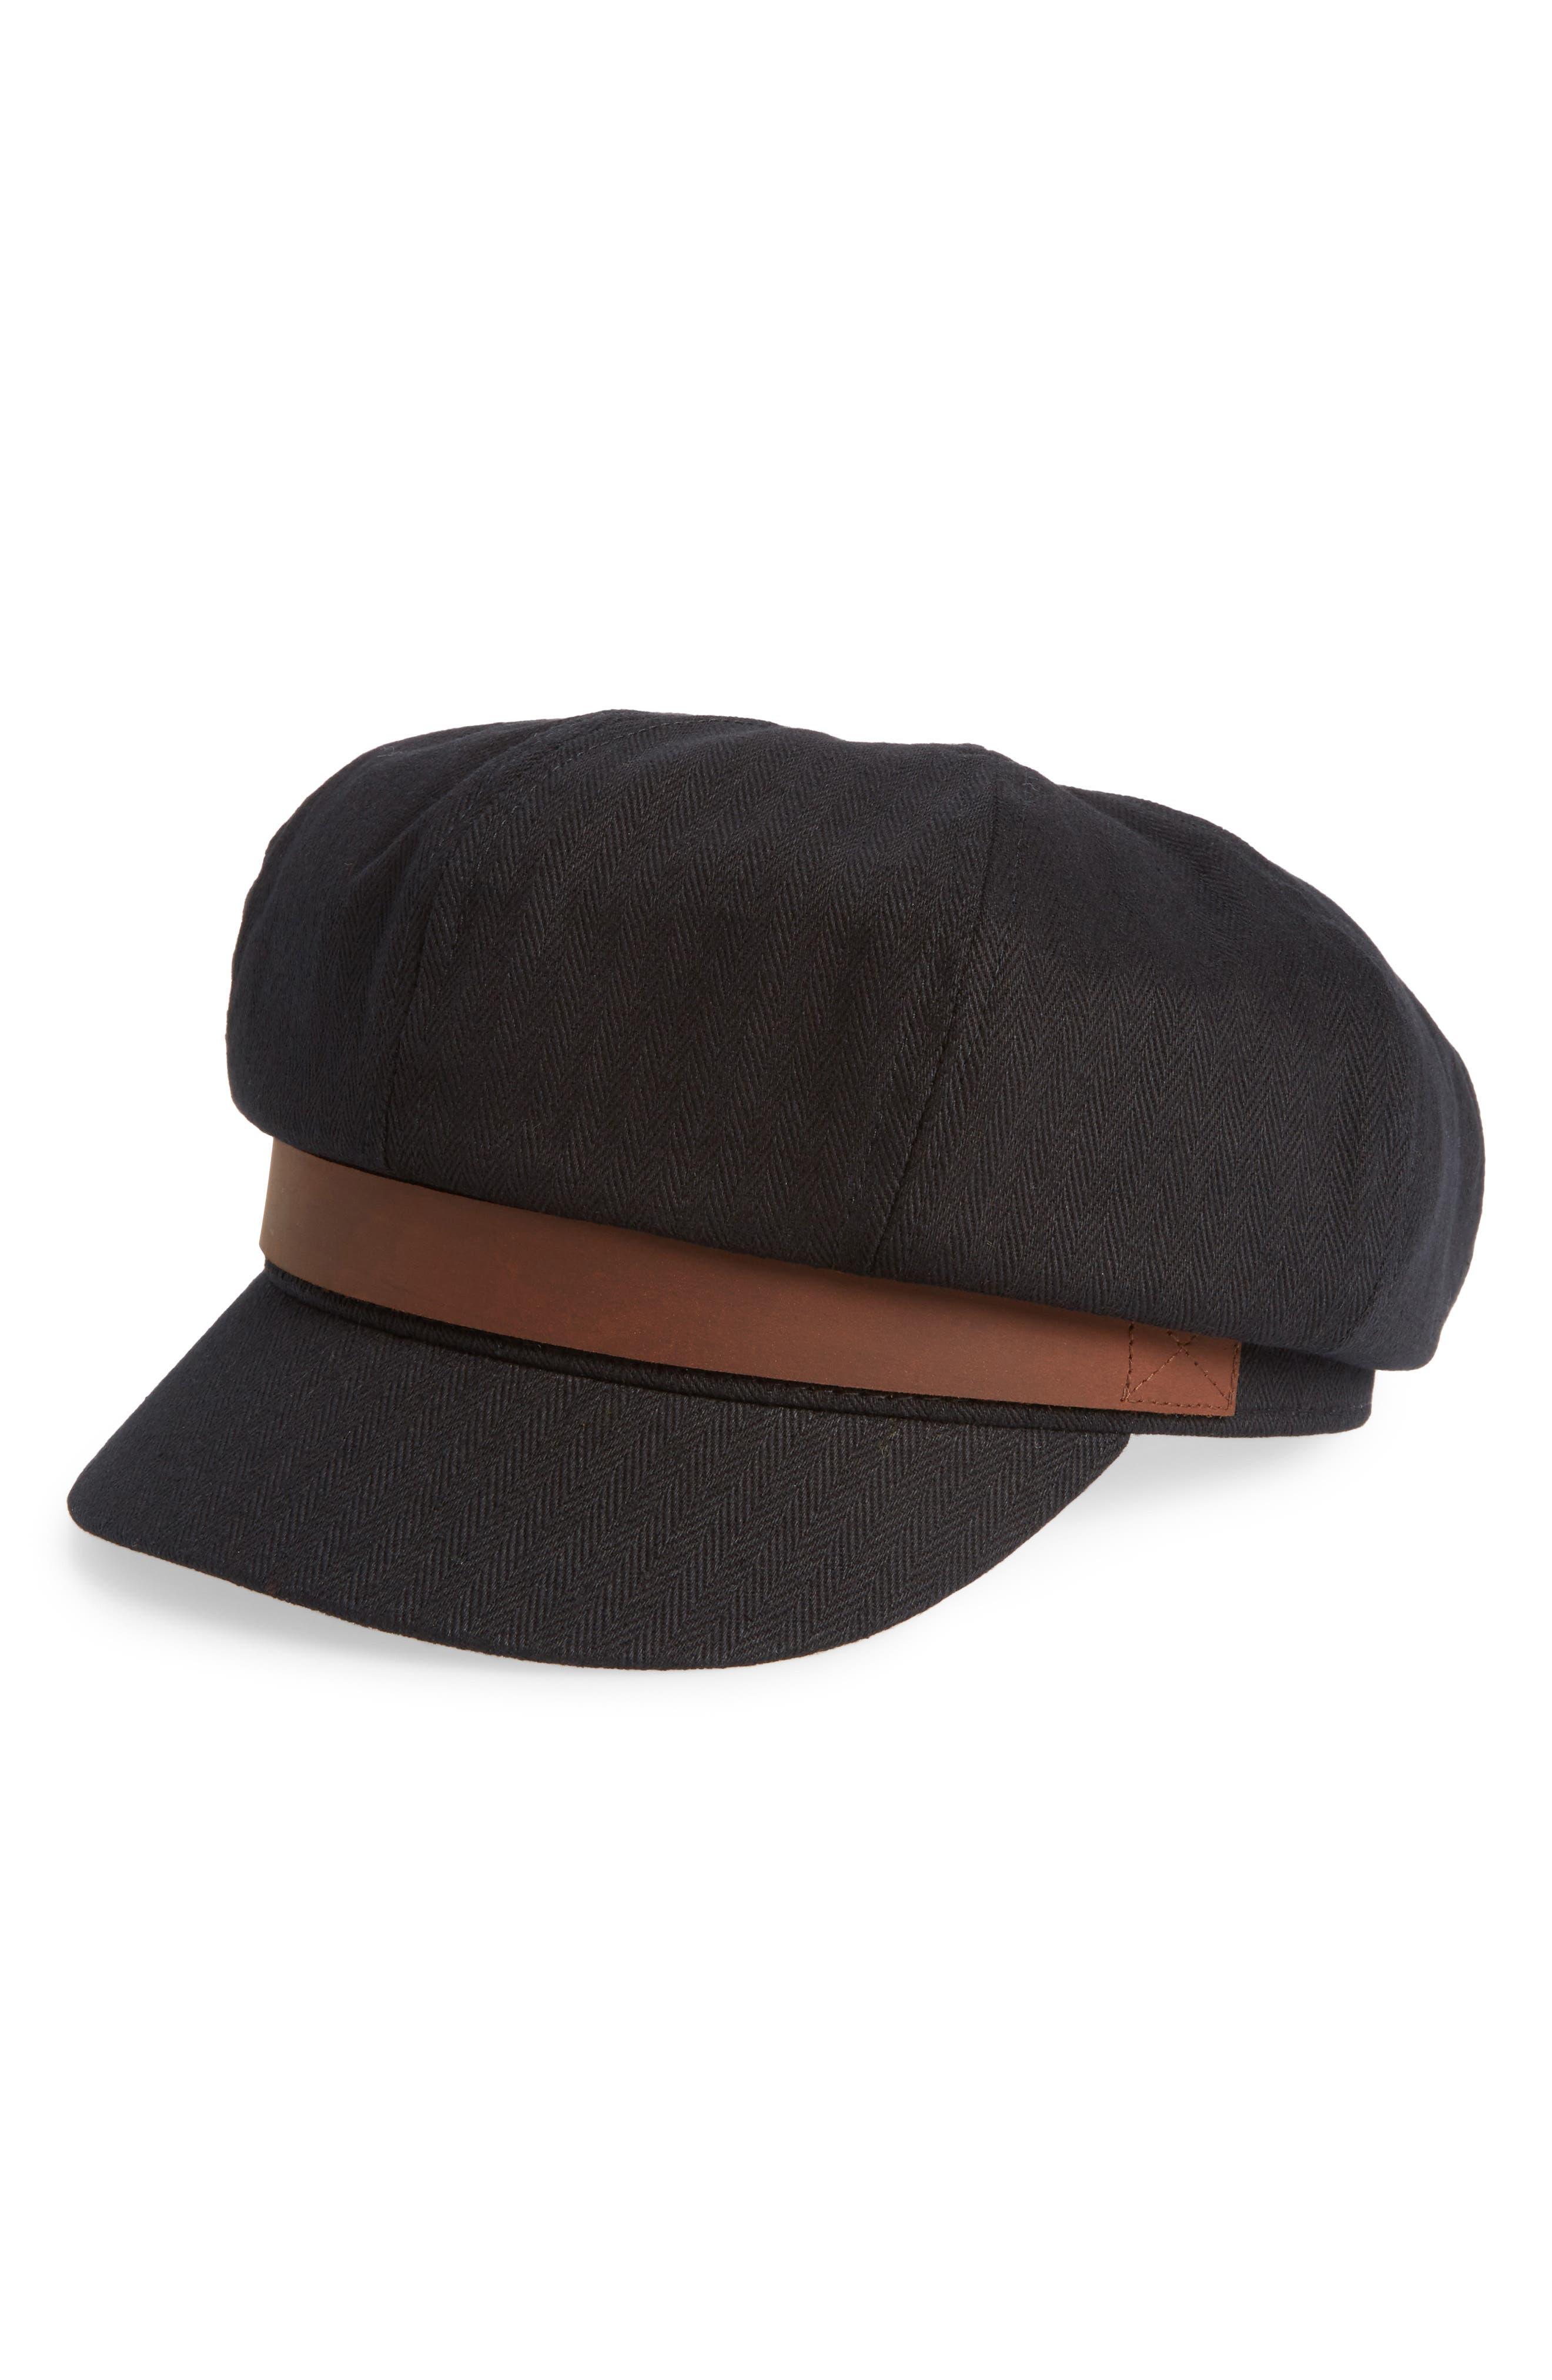 Brixton MONTREAL CAP - BLACK